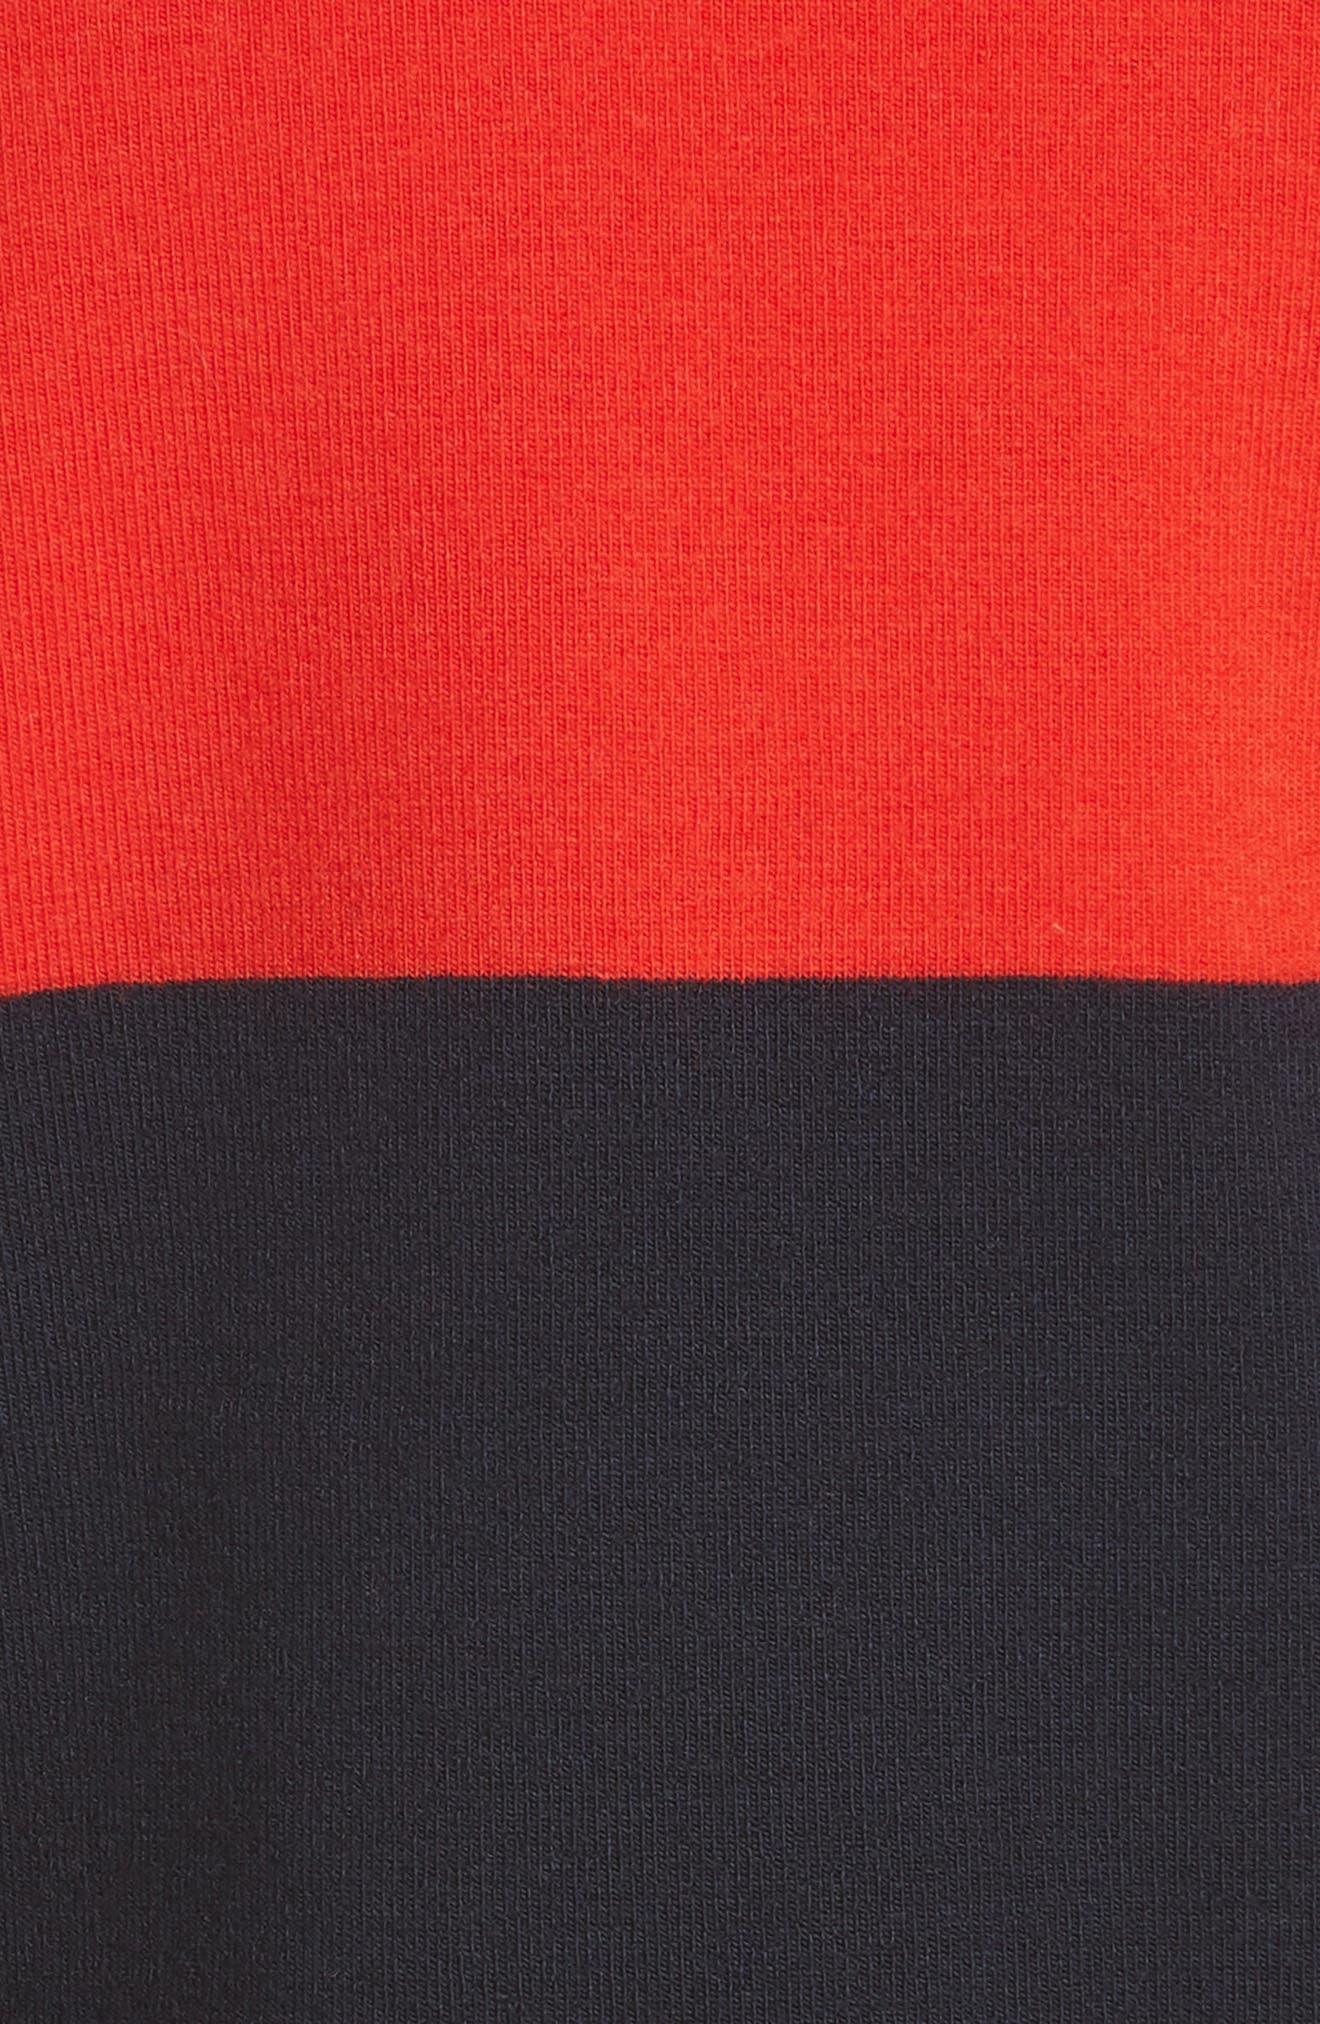 Diane von Furstenberg Star Sweater,                             Alternate thumbnail 5, color,                             Poppy Multi